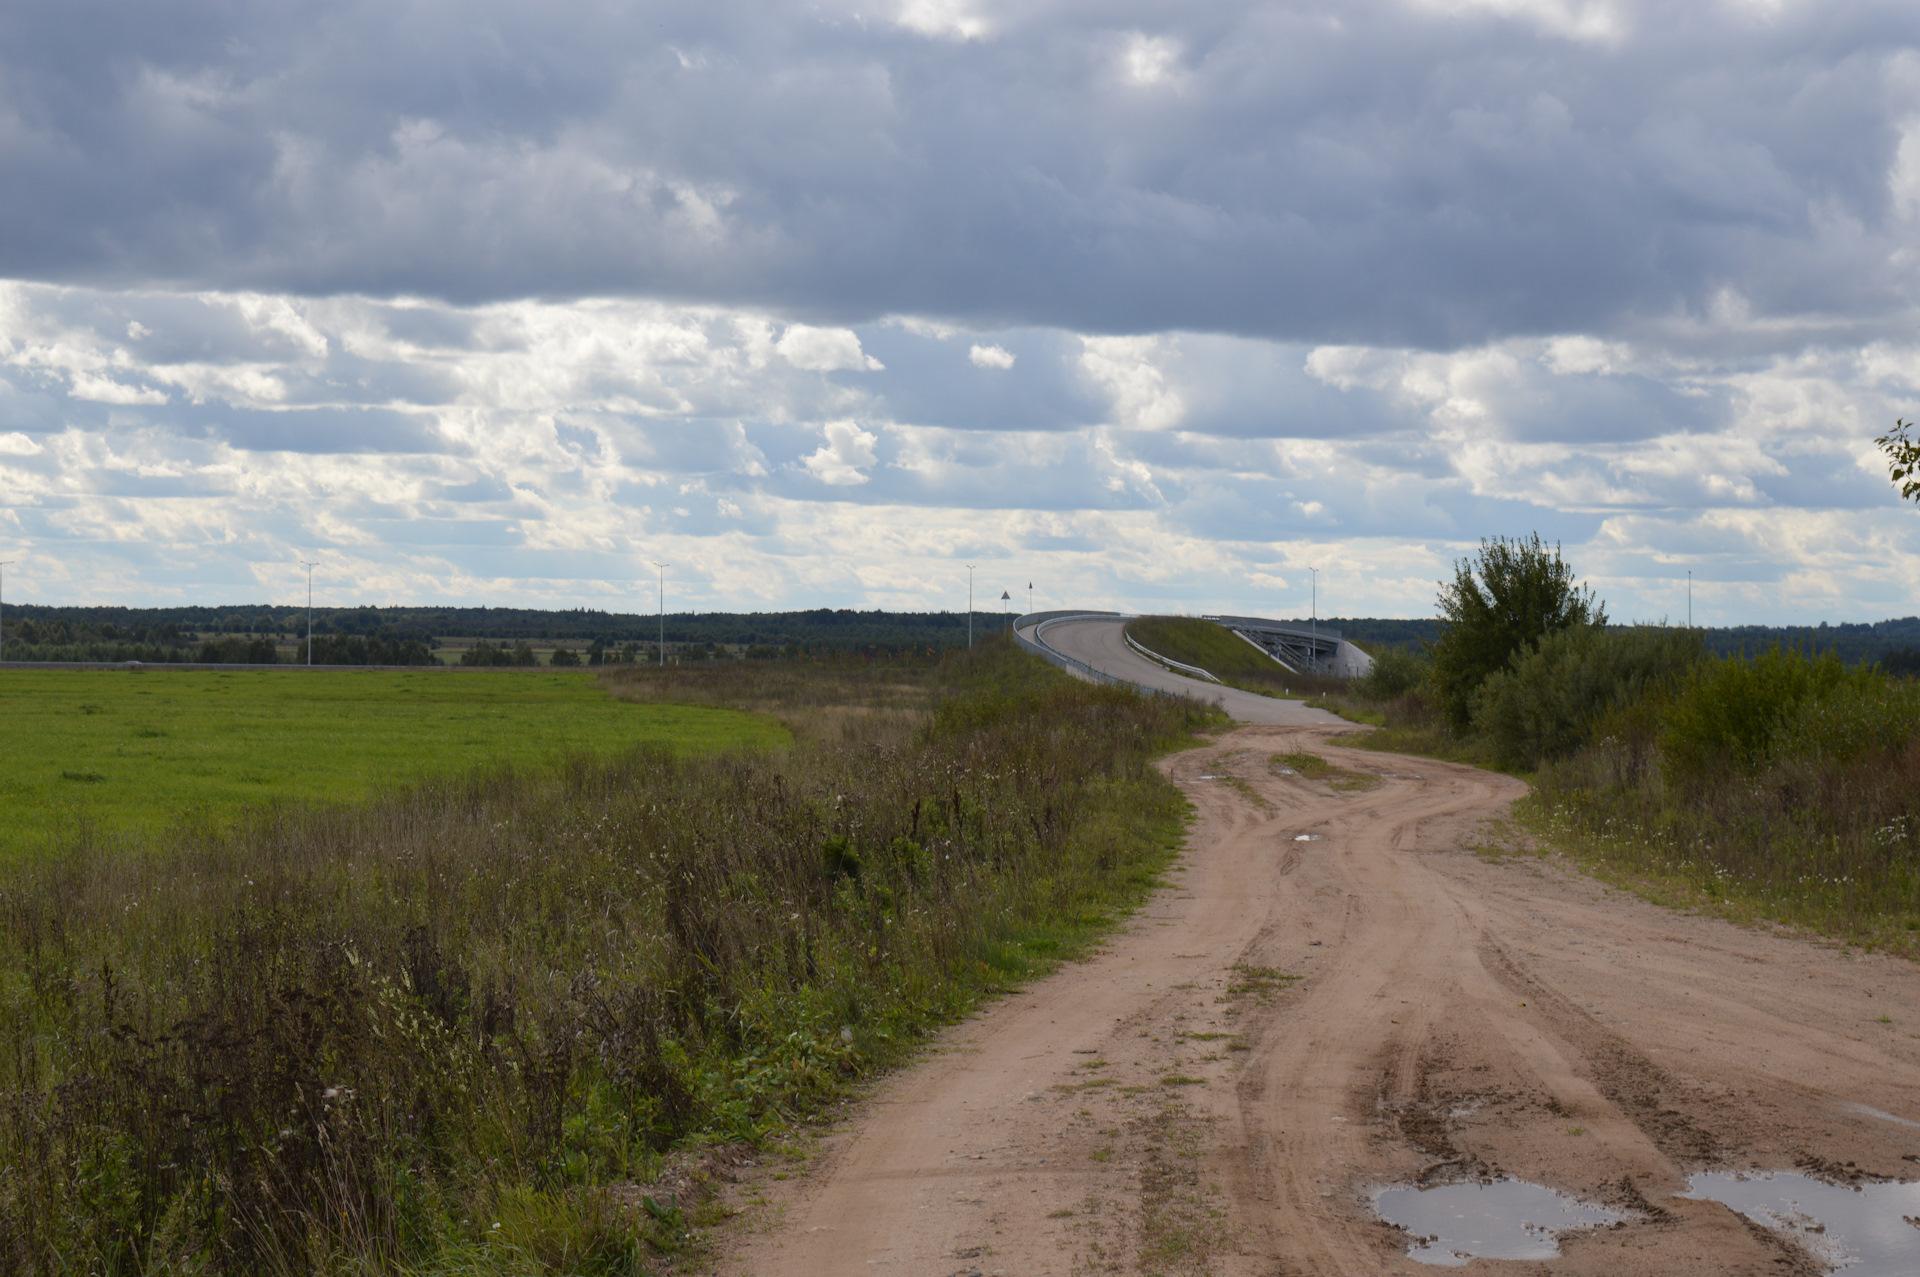 бронзовки фото терешкино торжокского р на красноярского края жалуются